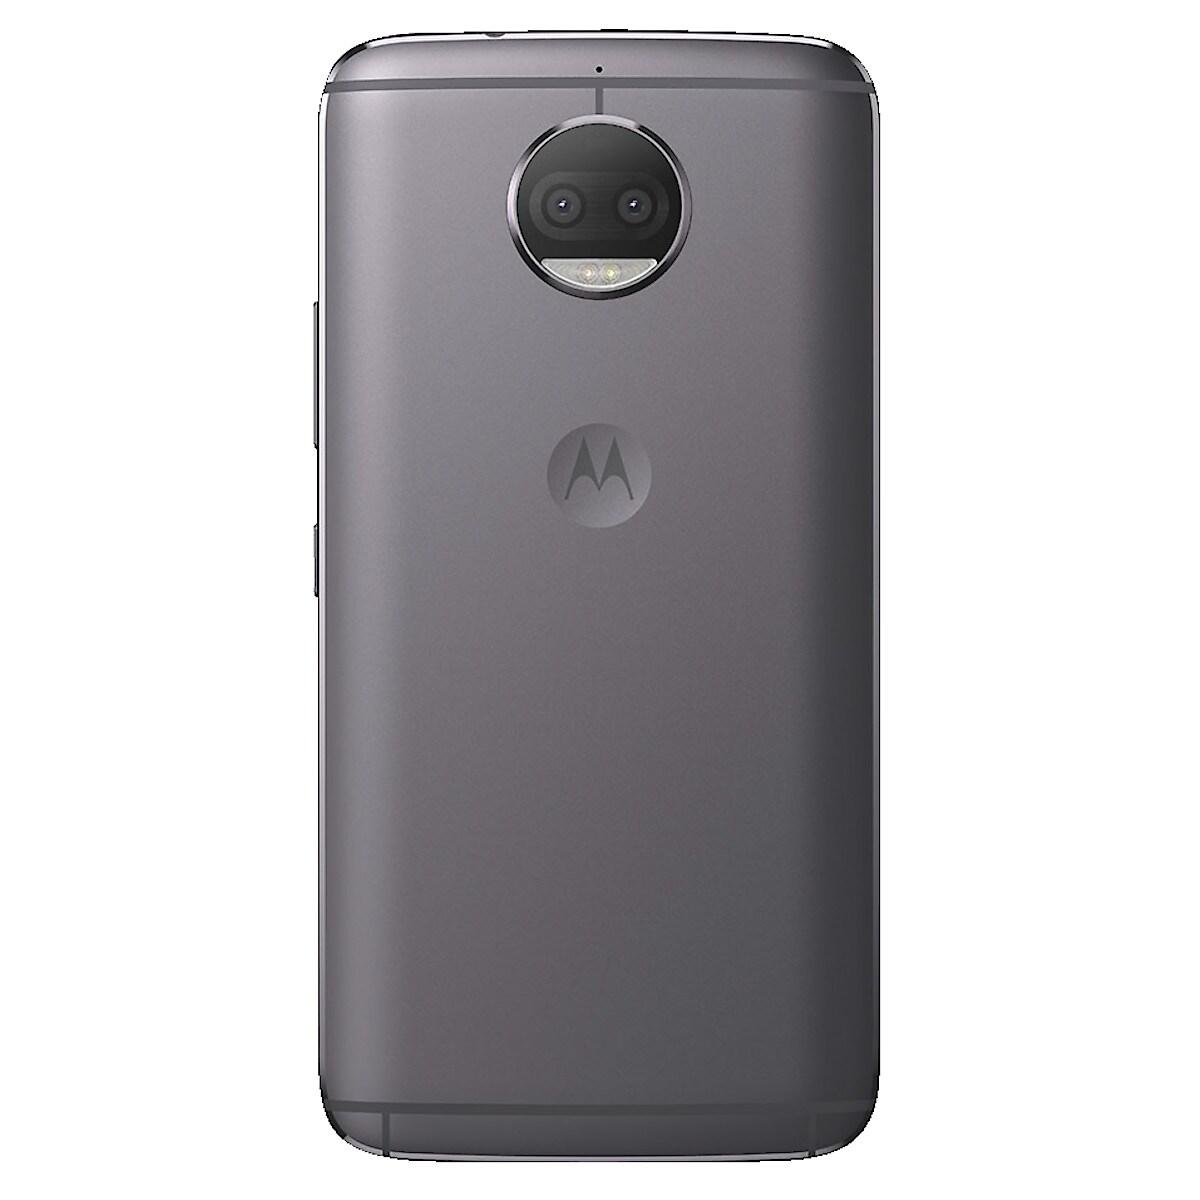 Mobiltelefon Moto G5S Plus Dual SIM